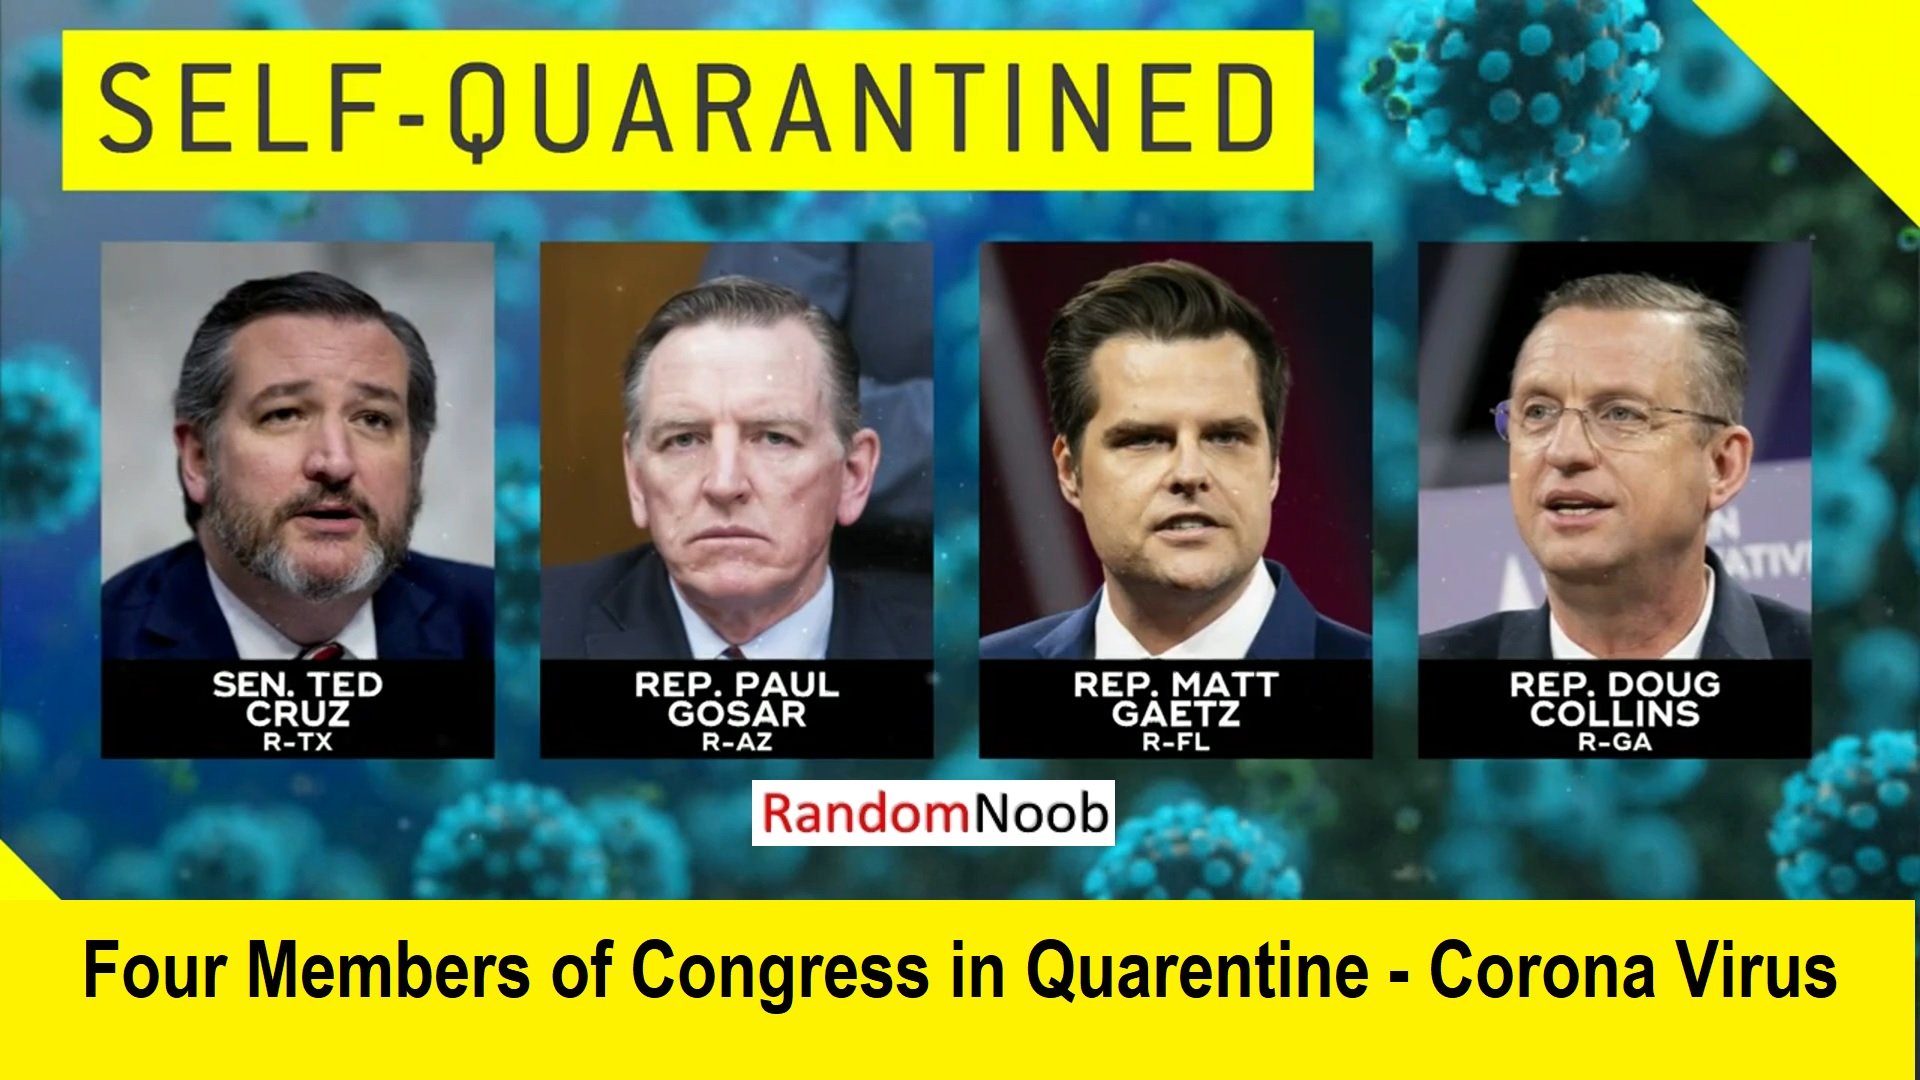 Congress Members Quarantine due to Coronavirus COVID-19